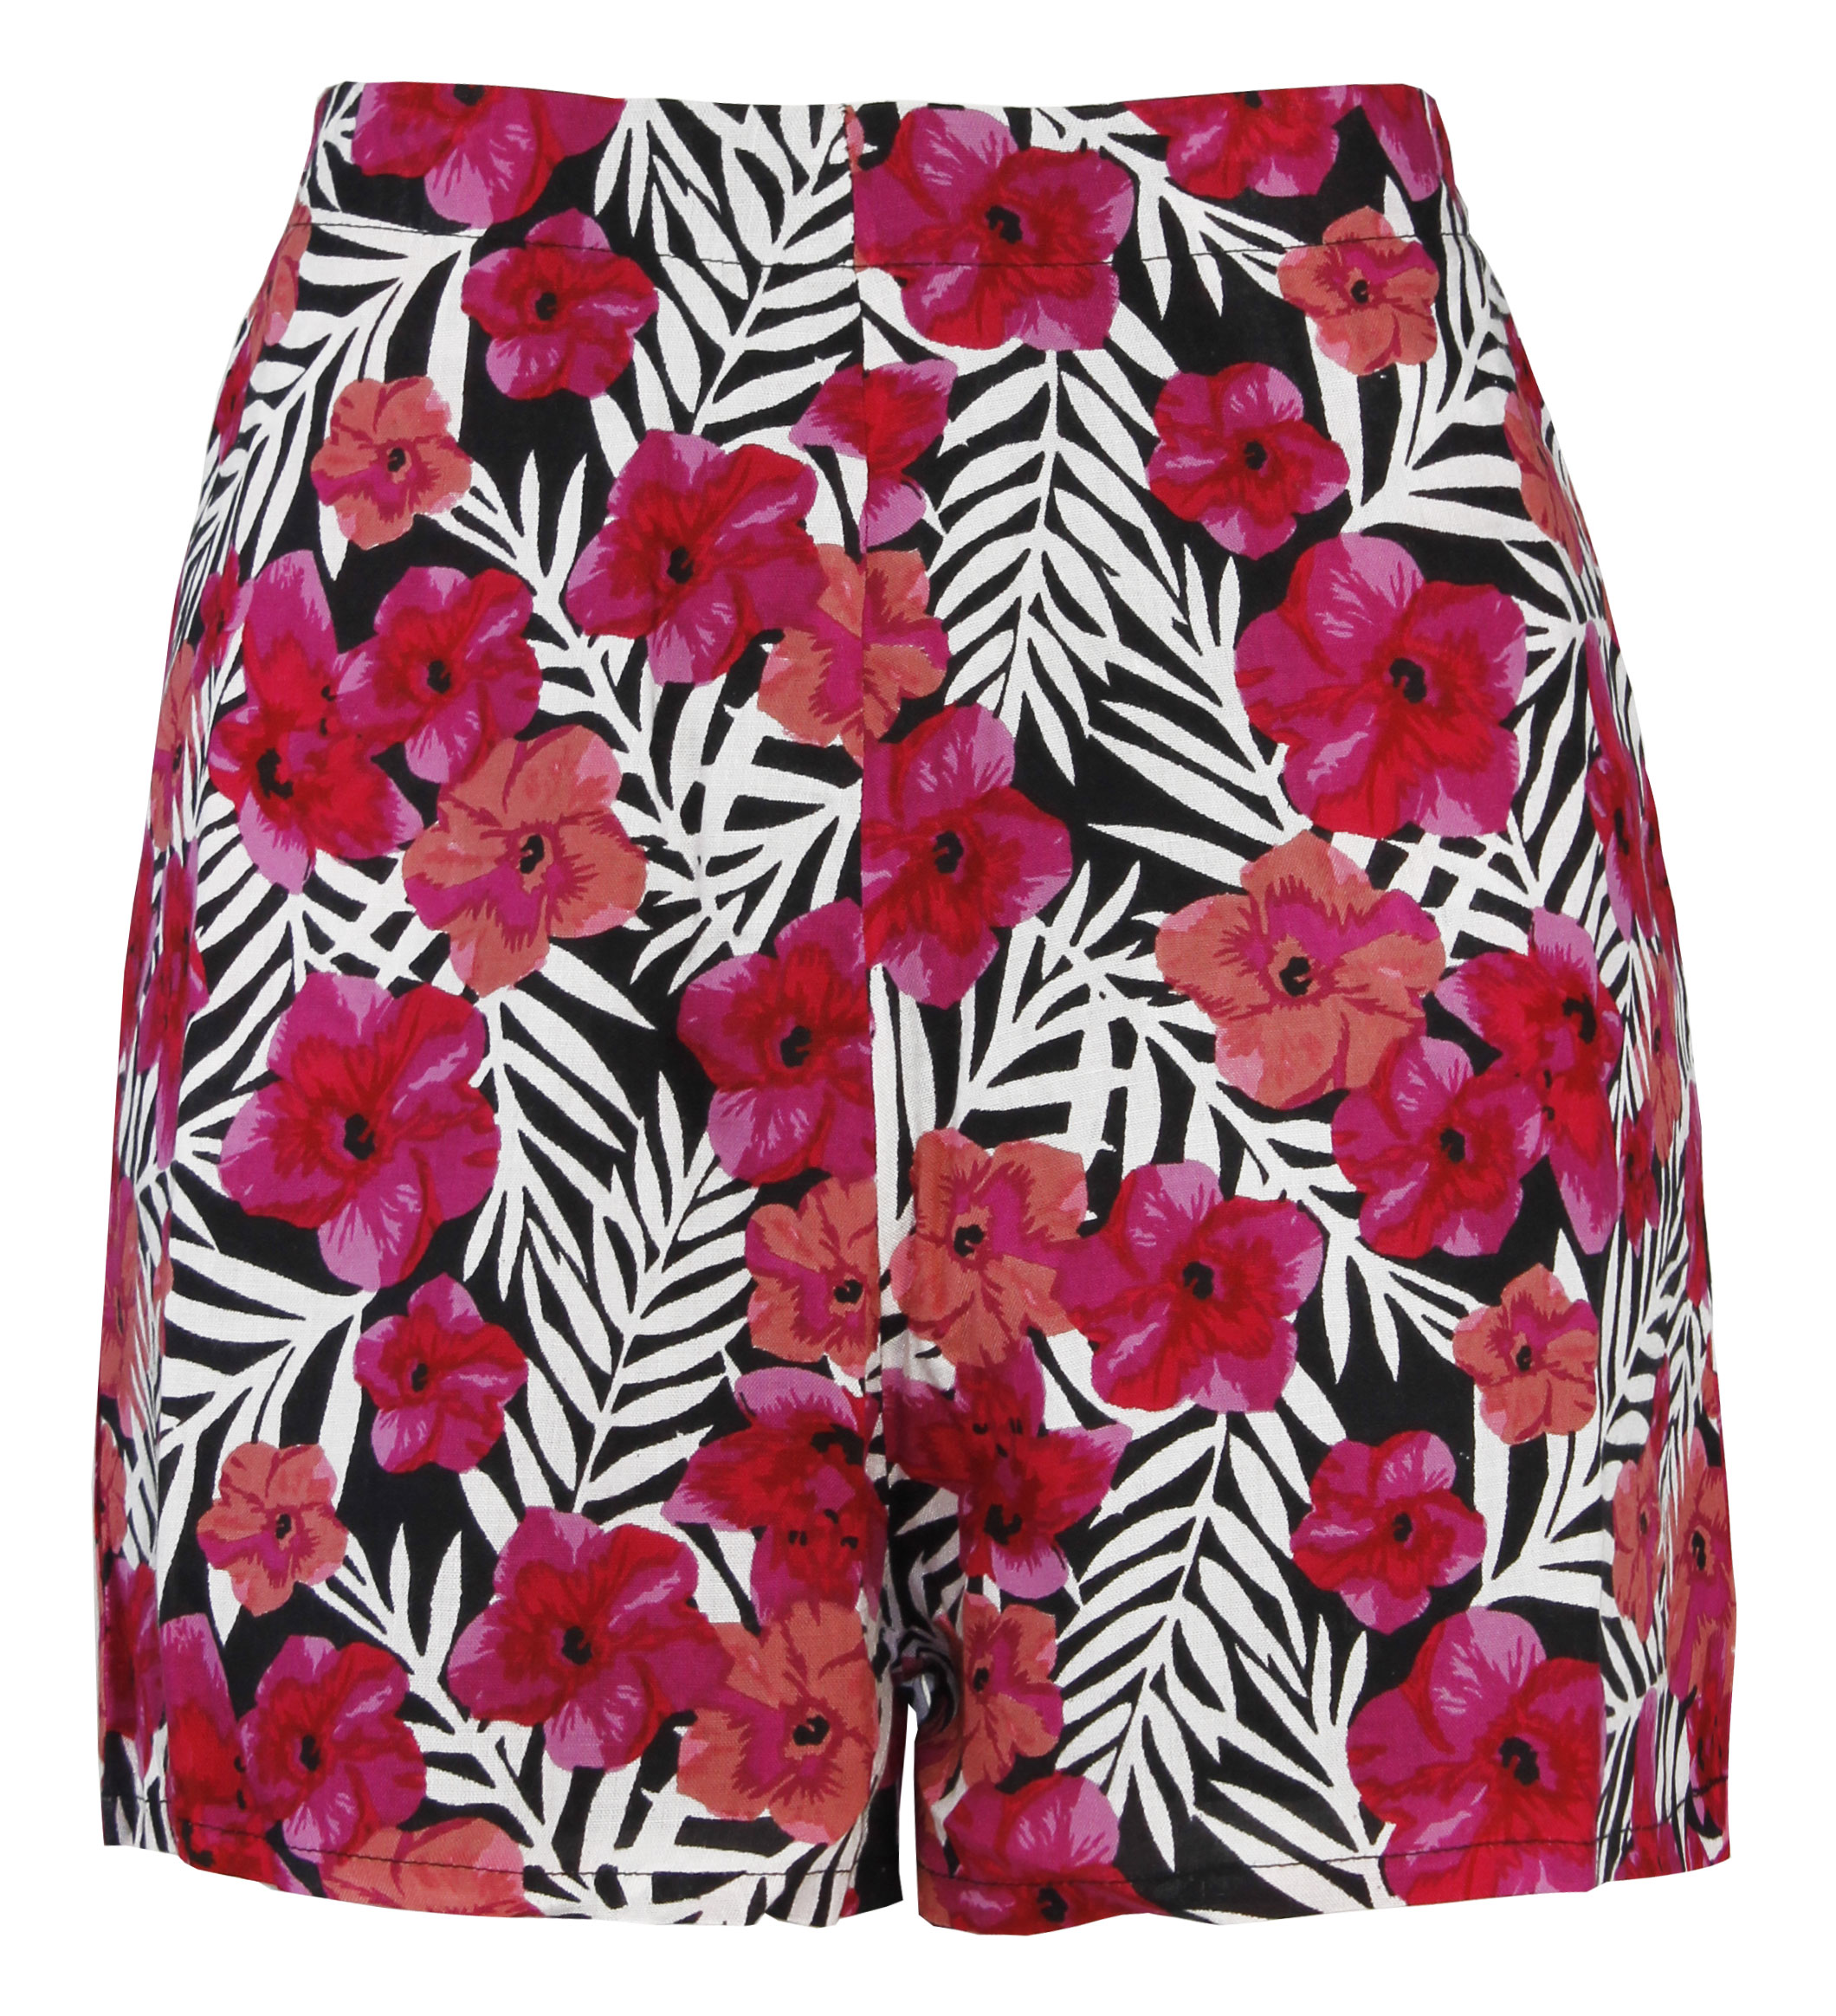 NEW LADIES SUMMER FLORAL PRINT SHORTS WOMENS HOTPANTS SHORT PANTS   eBay